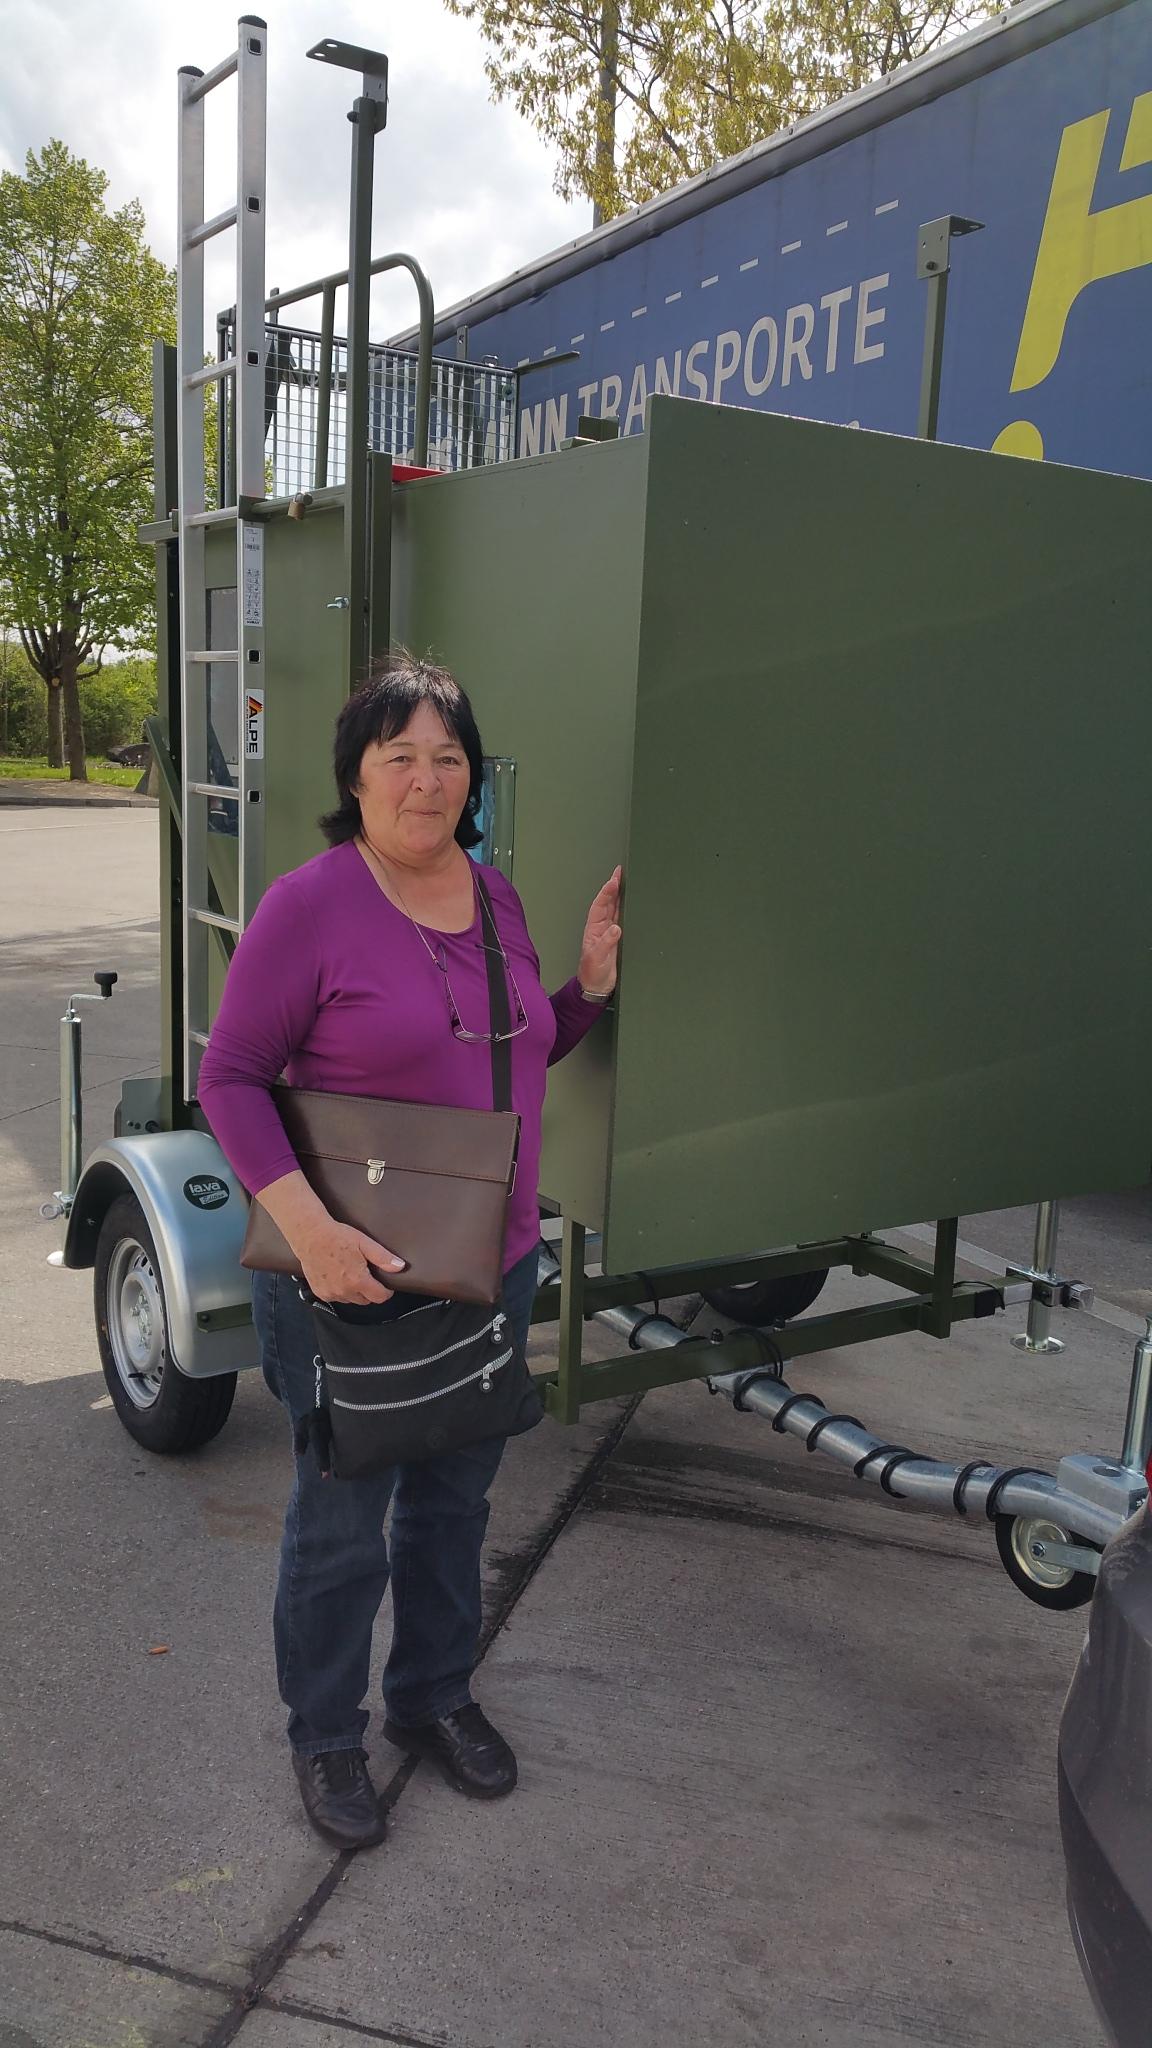 Mobile Jagdkanzel